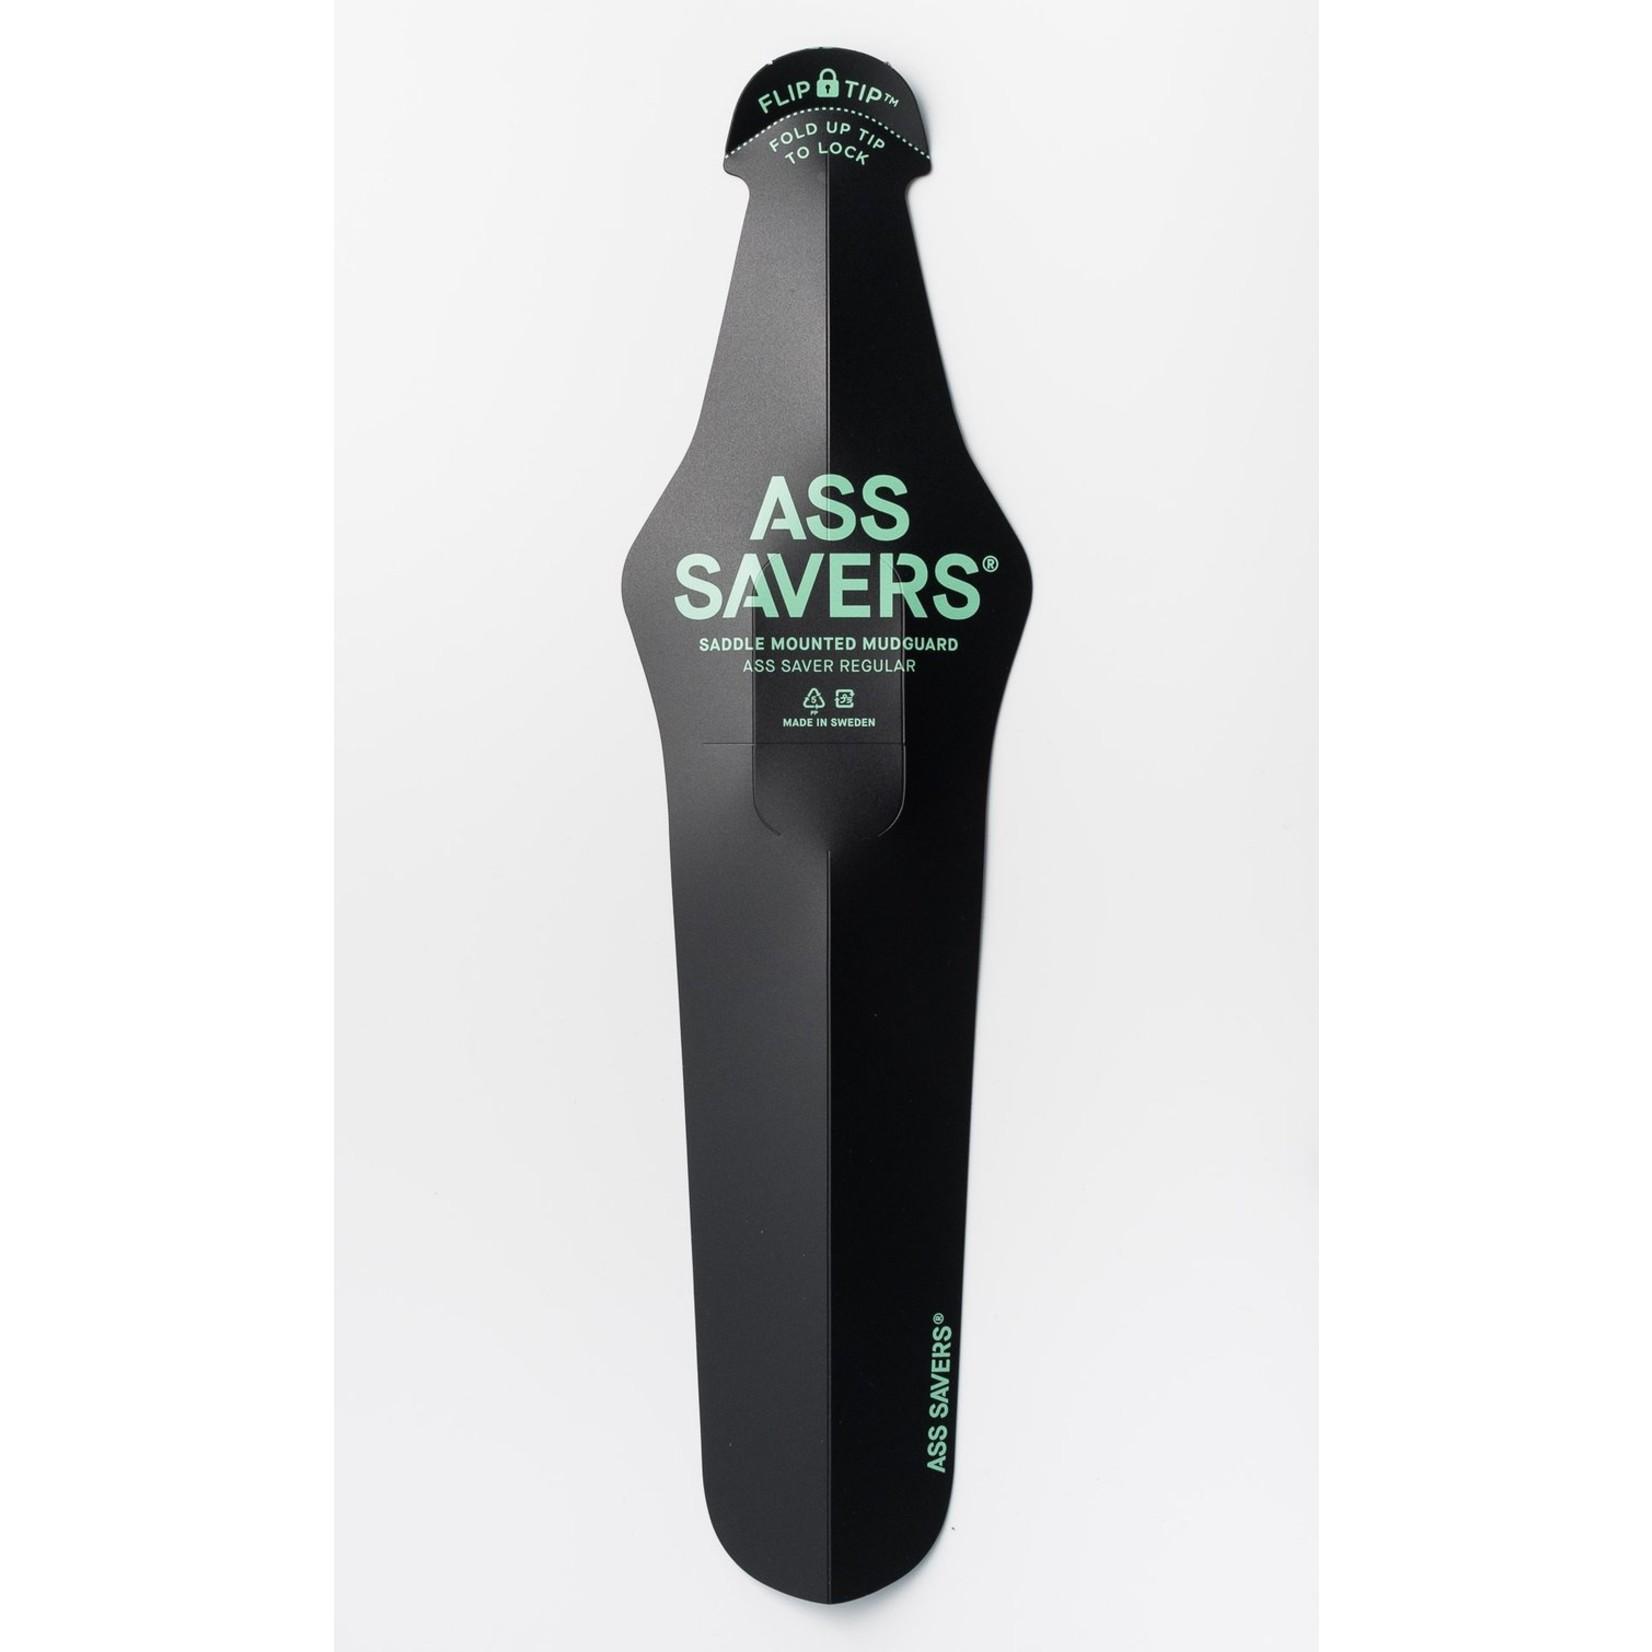 Ass Saver Spatbord Ass Saver Regular zwart of wit